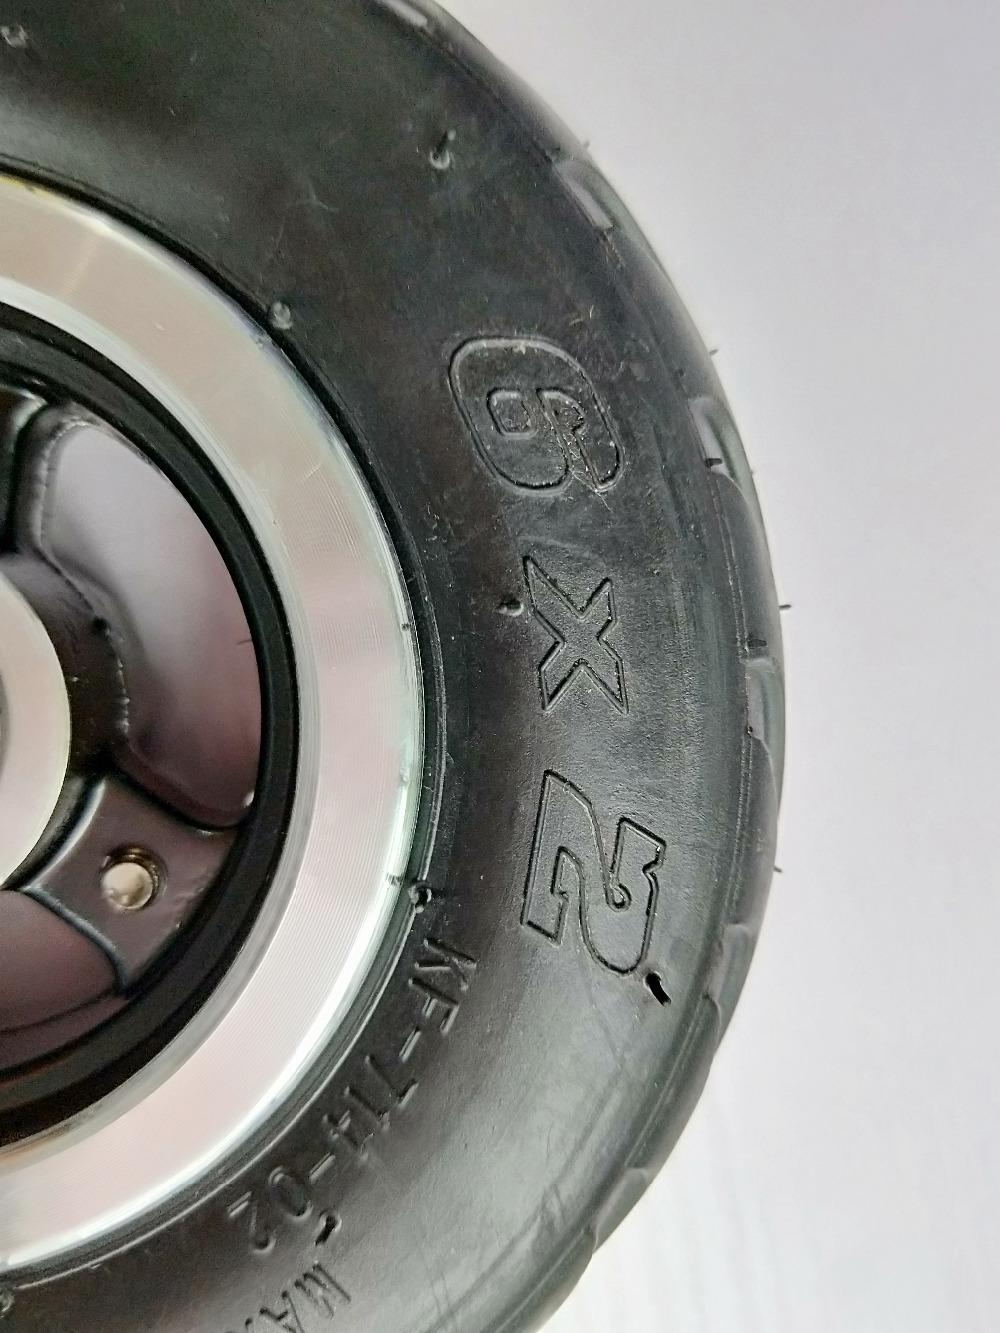 JASION ES PRO 6 дюймов 10 кг 36V 9,6Ah LG!